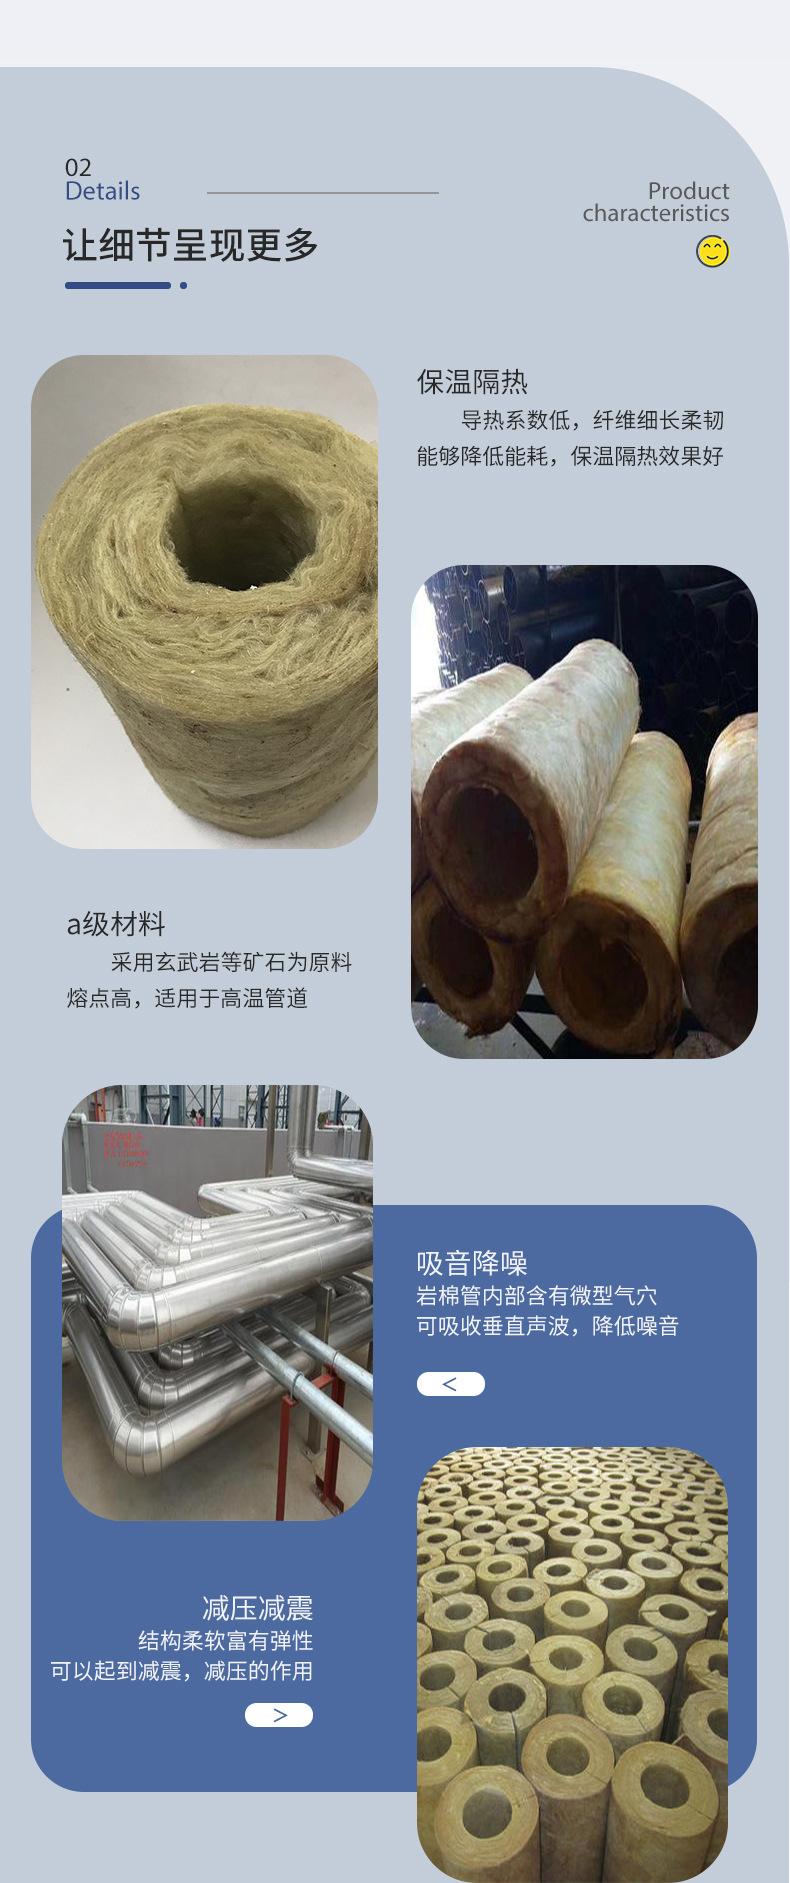 侯马岩棉管